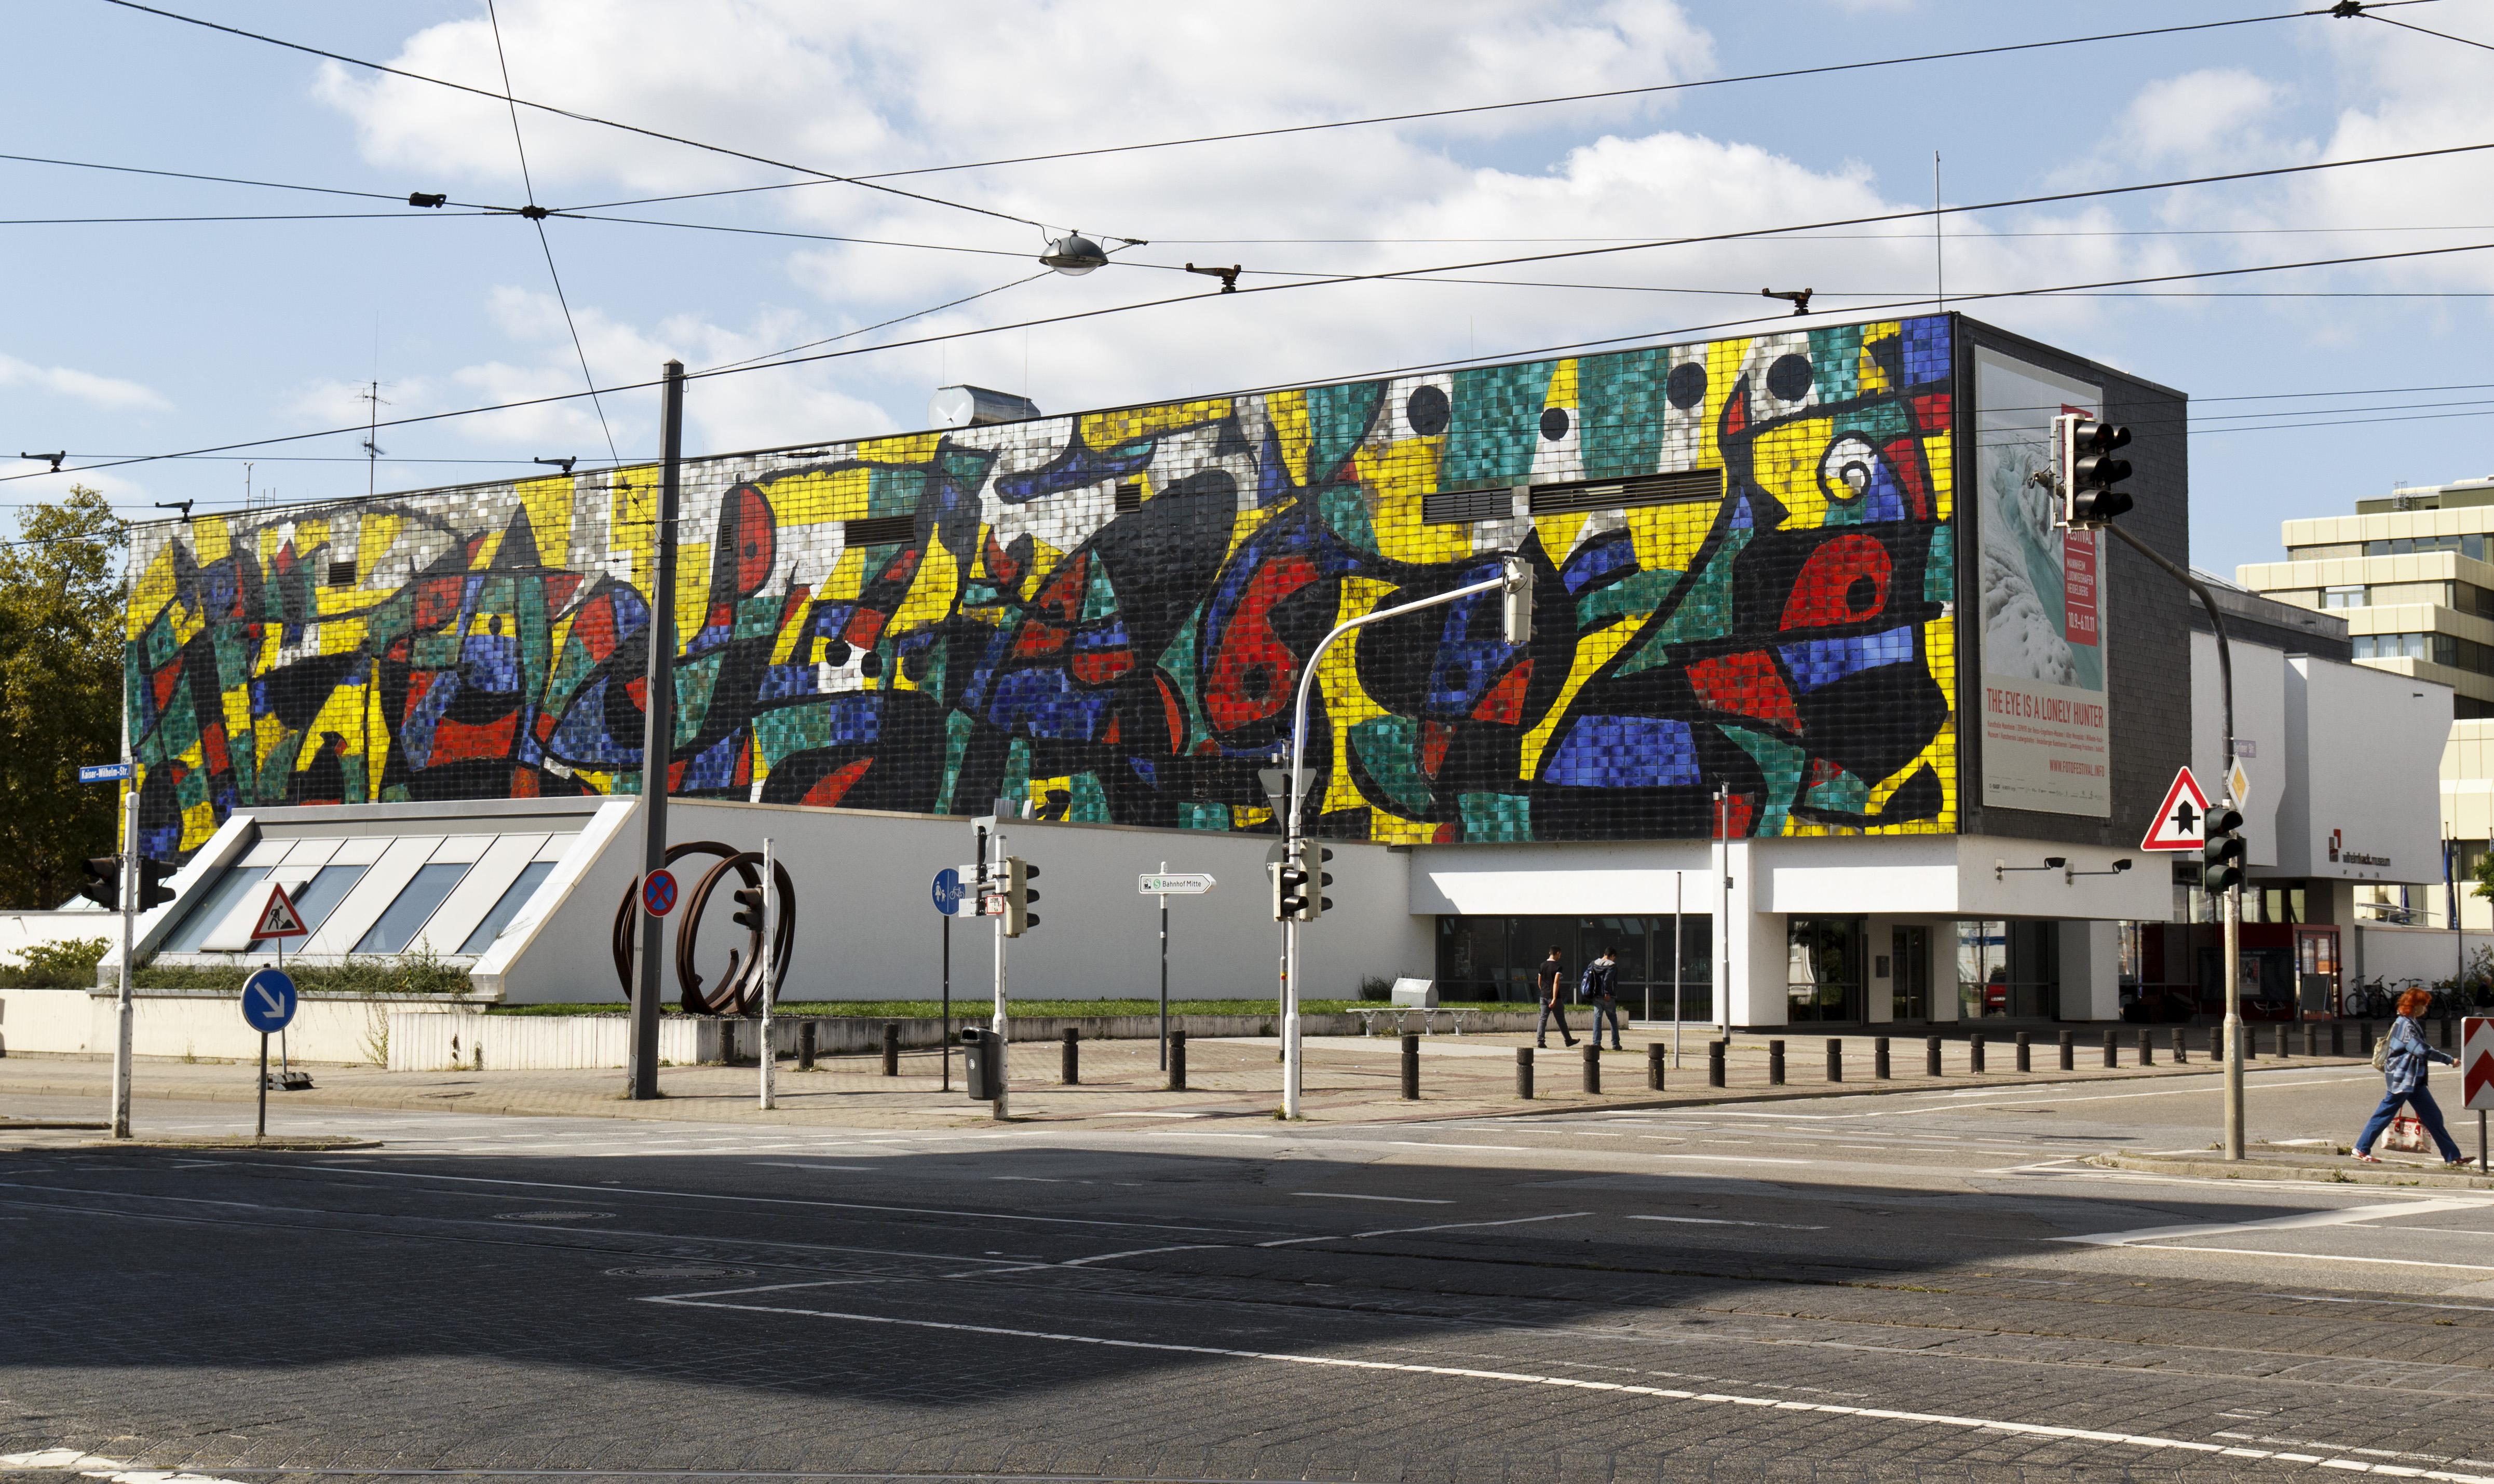 Joan Miró, Mur de céramique (Wilhelm-Hack-Museum, Ludwigshafen, 1979) / By Rudolf Stricker via Wikimedia Commons